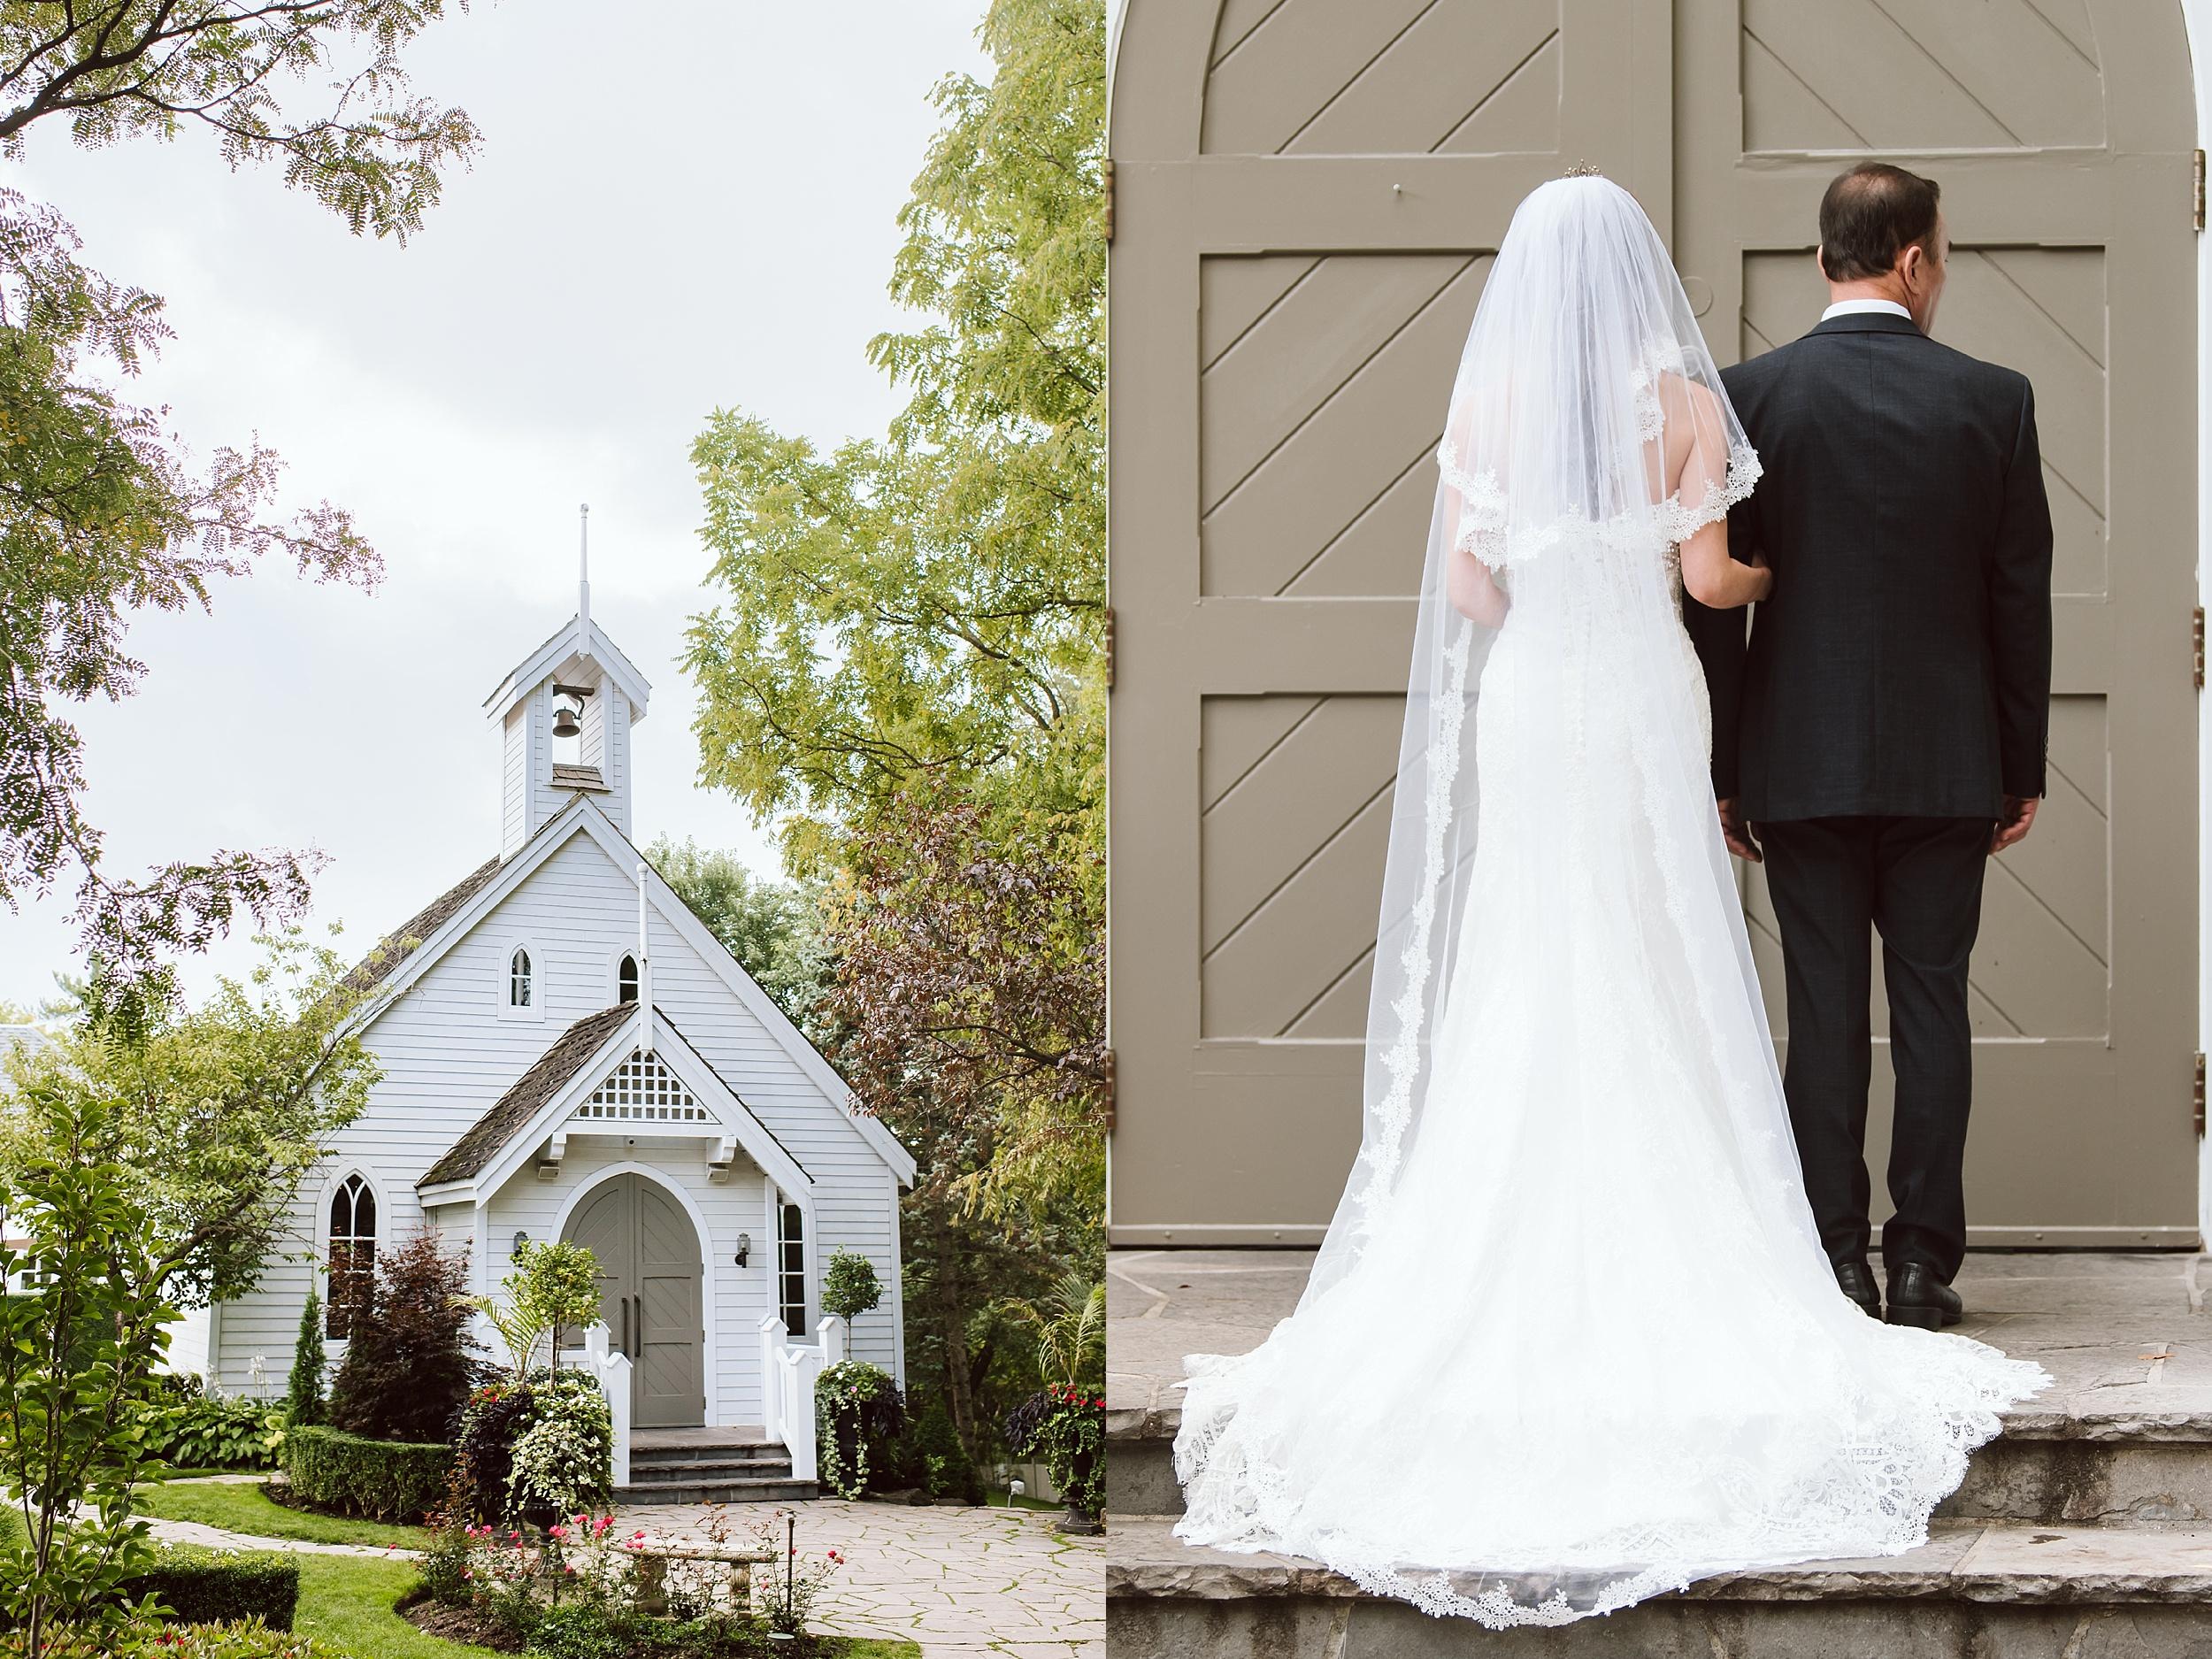 Doctors_House_Kleinburg_Wedding_Toronto_Photographer_0019.jpg